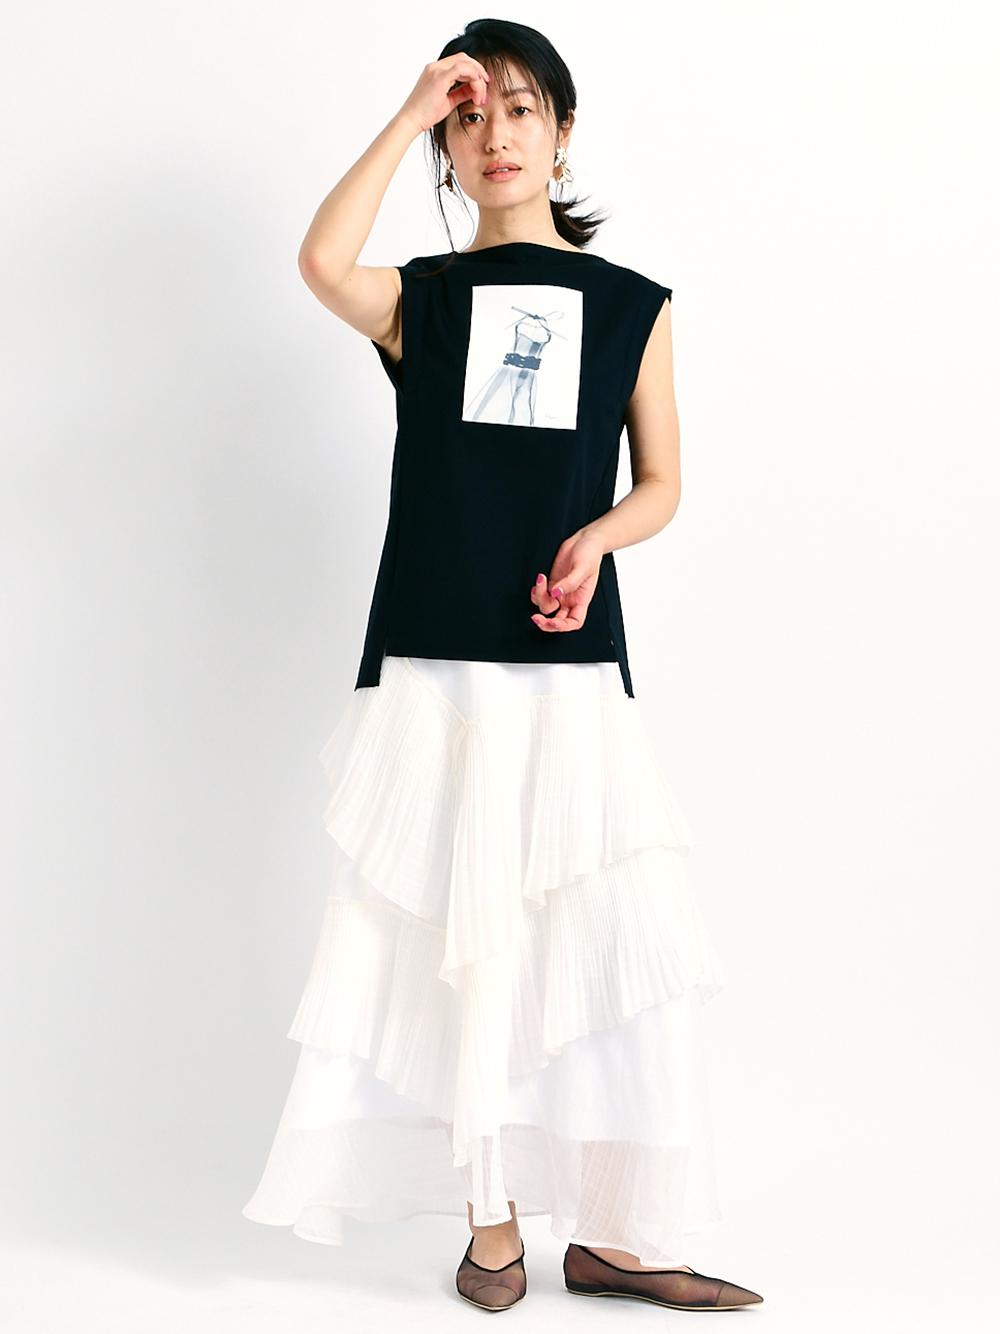 Albert KoetsierロングTシャツ | CWCT211103